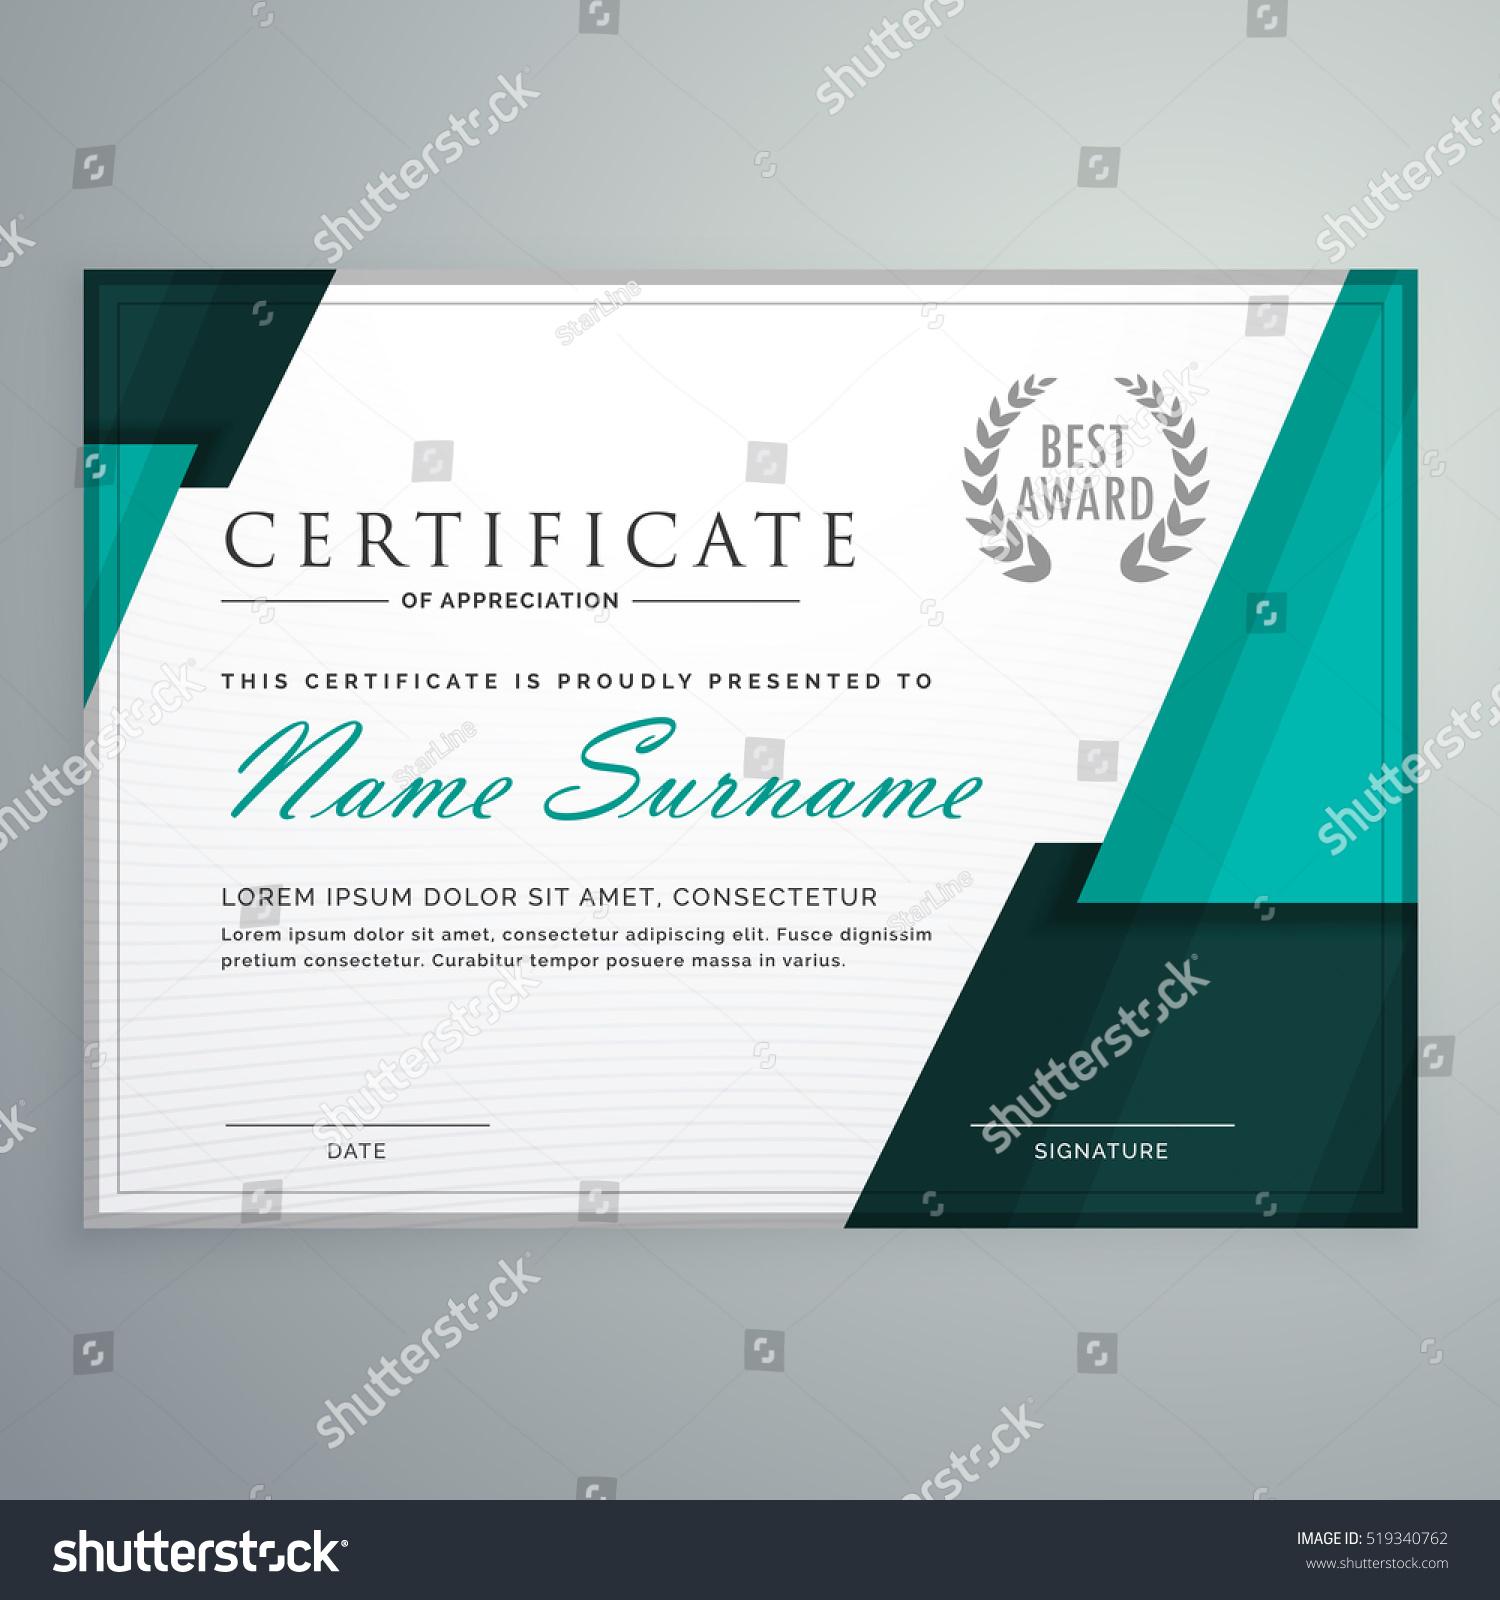 Edit Vectors Free Online Modern Certificate